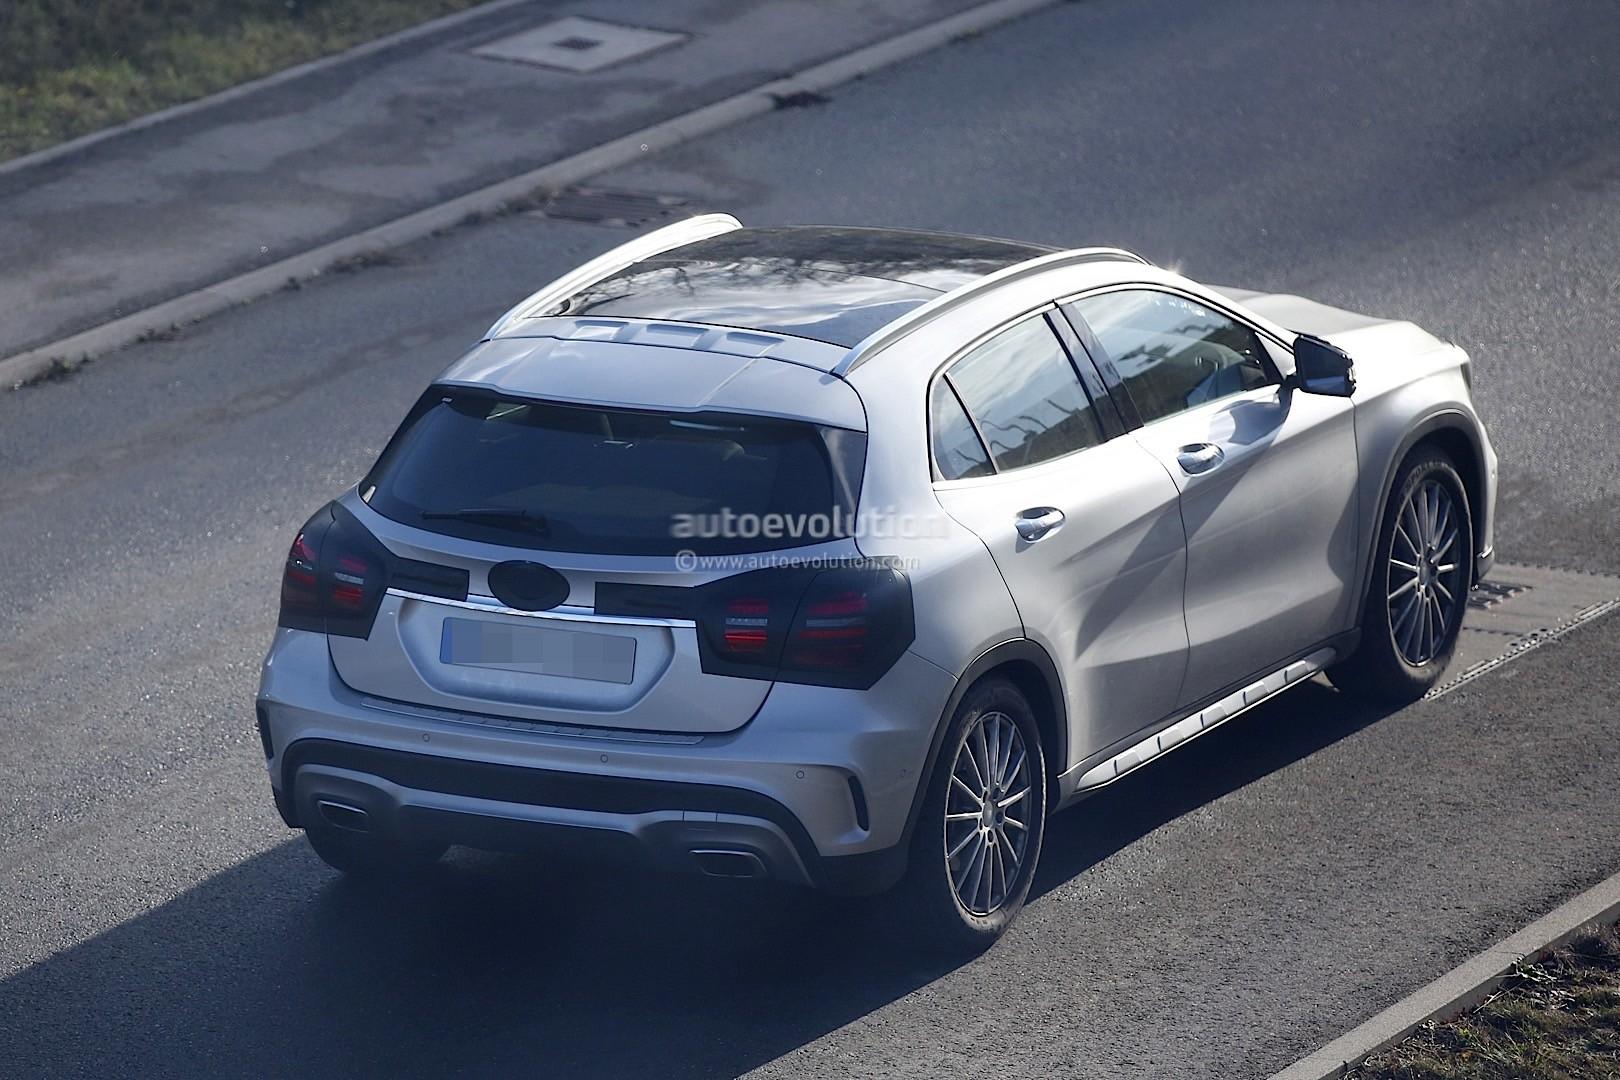 2017 Mercedes-Benz GLA Facelift Spied with Minimum Camo